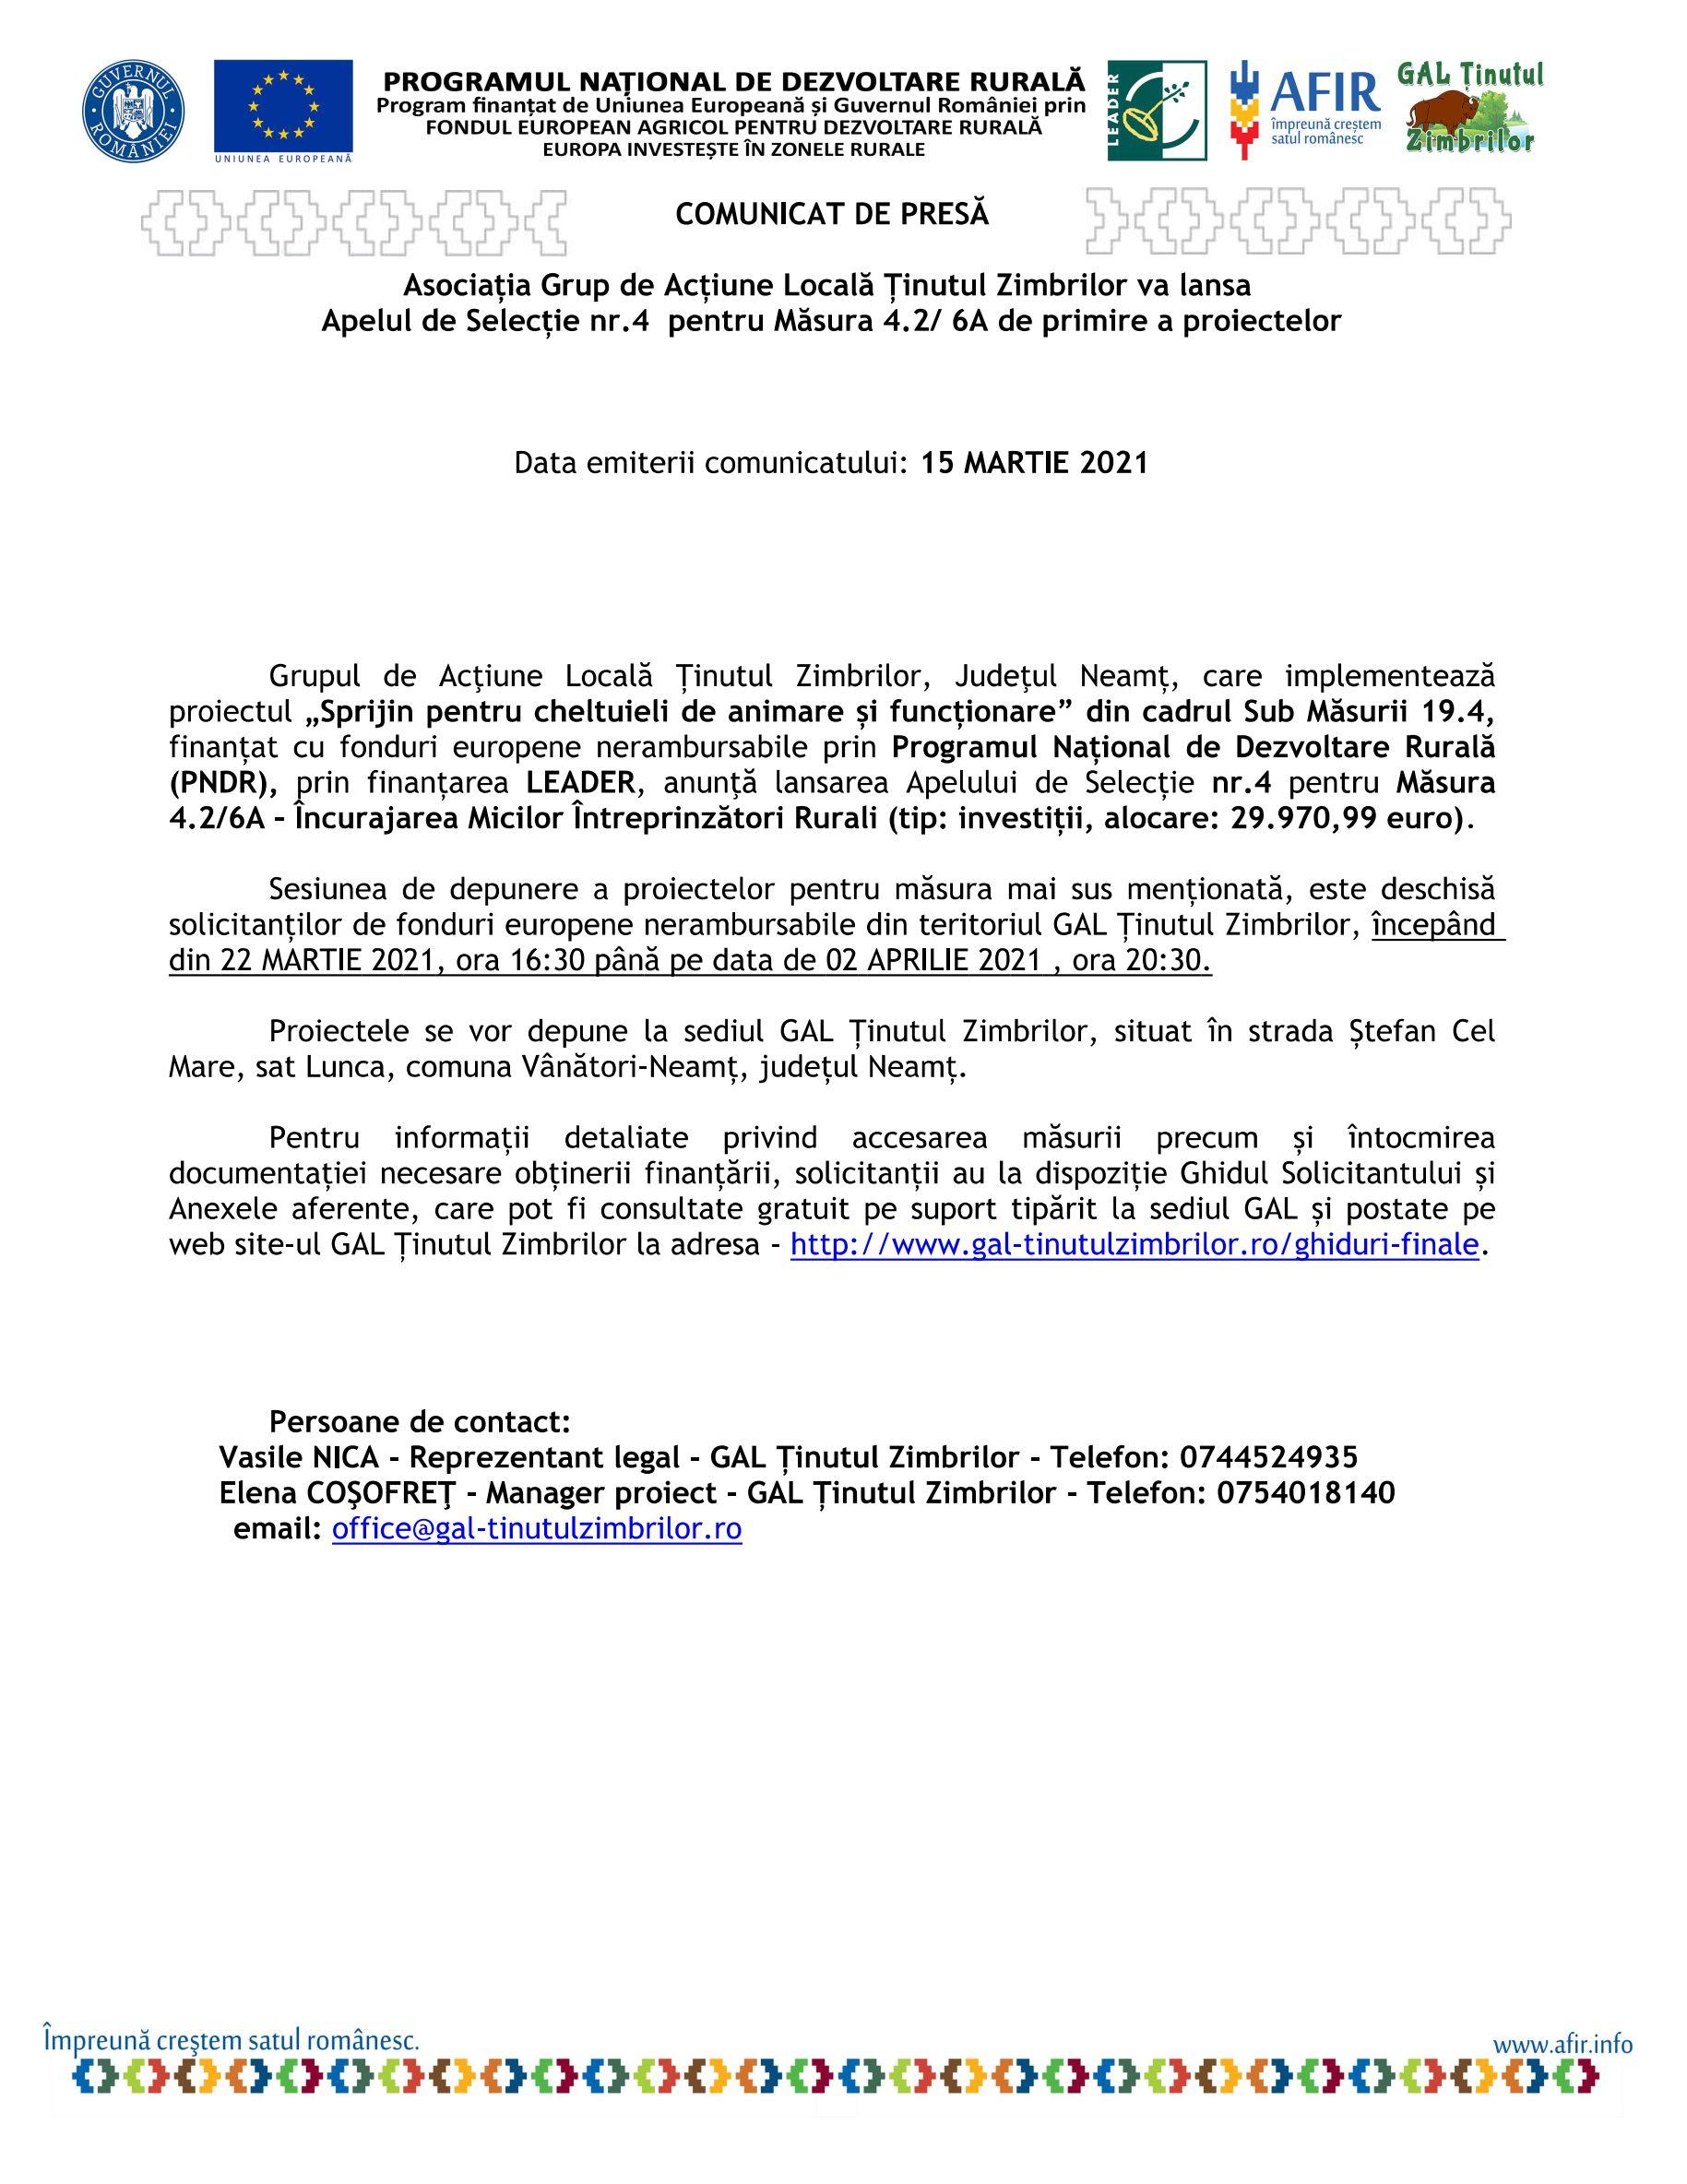 comunicat-zimbri-15mart